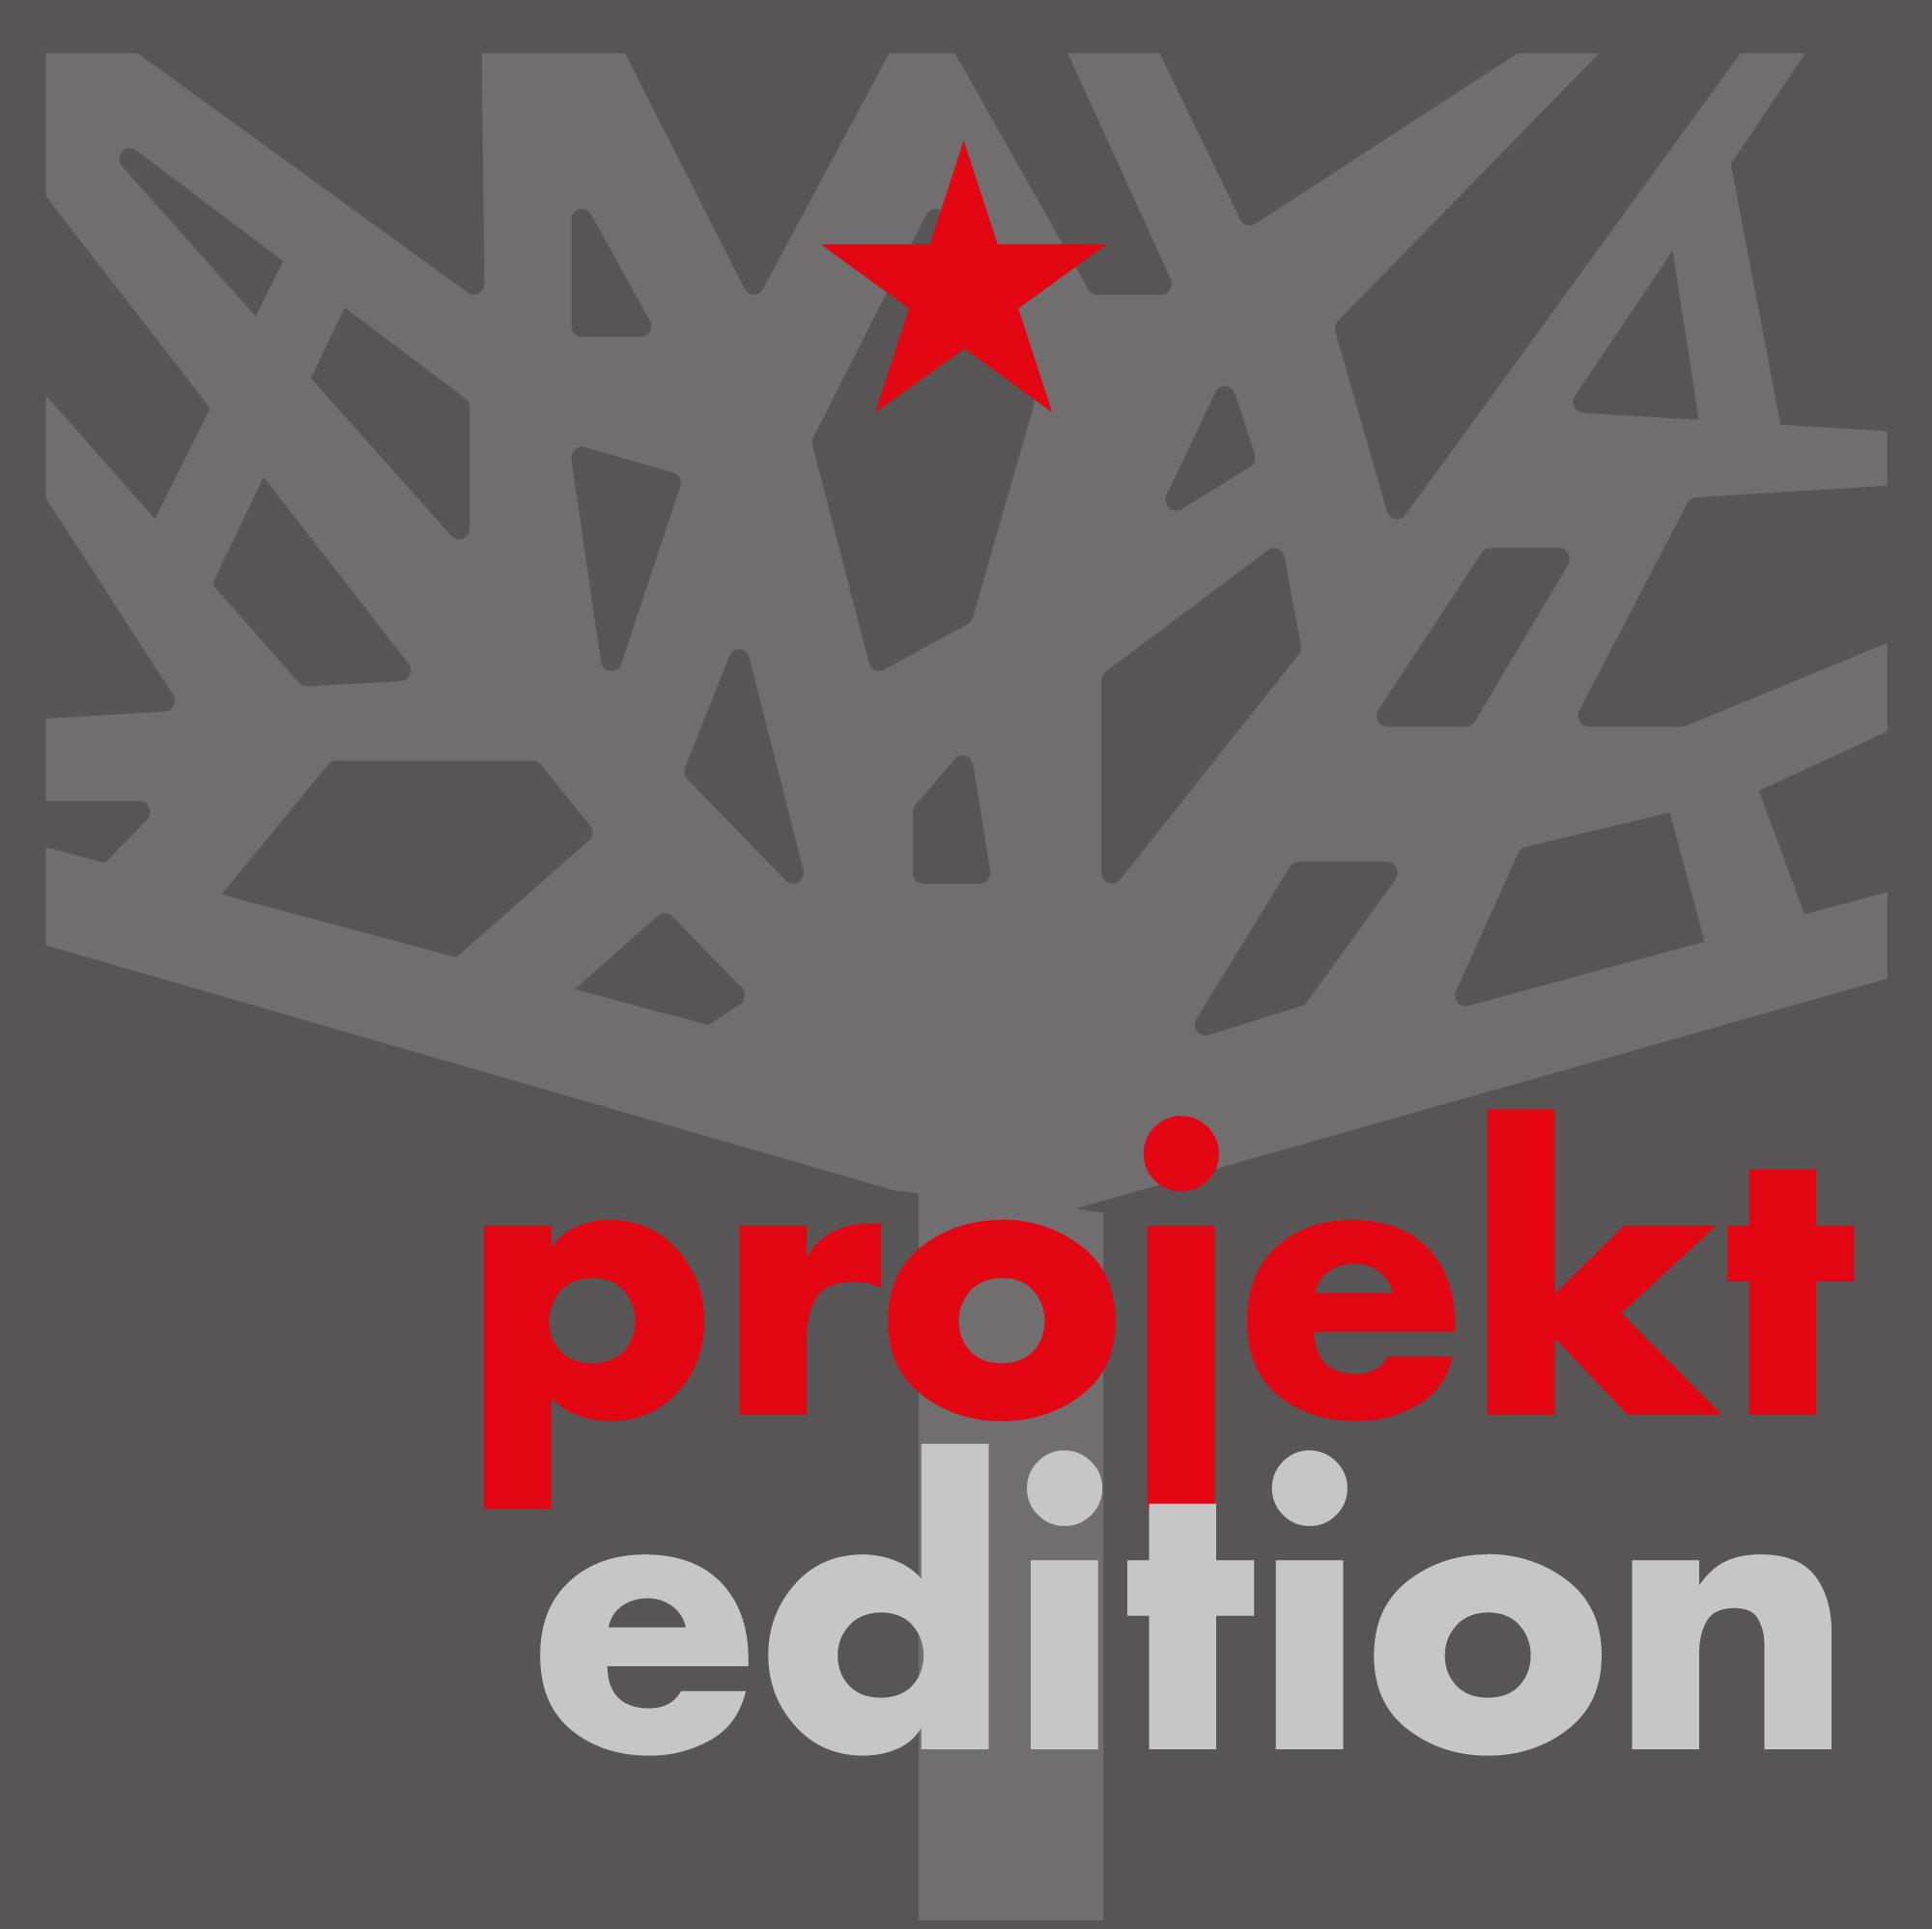 Projekt Edition